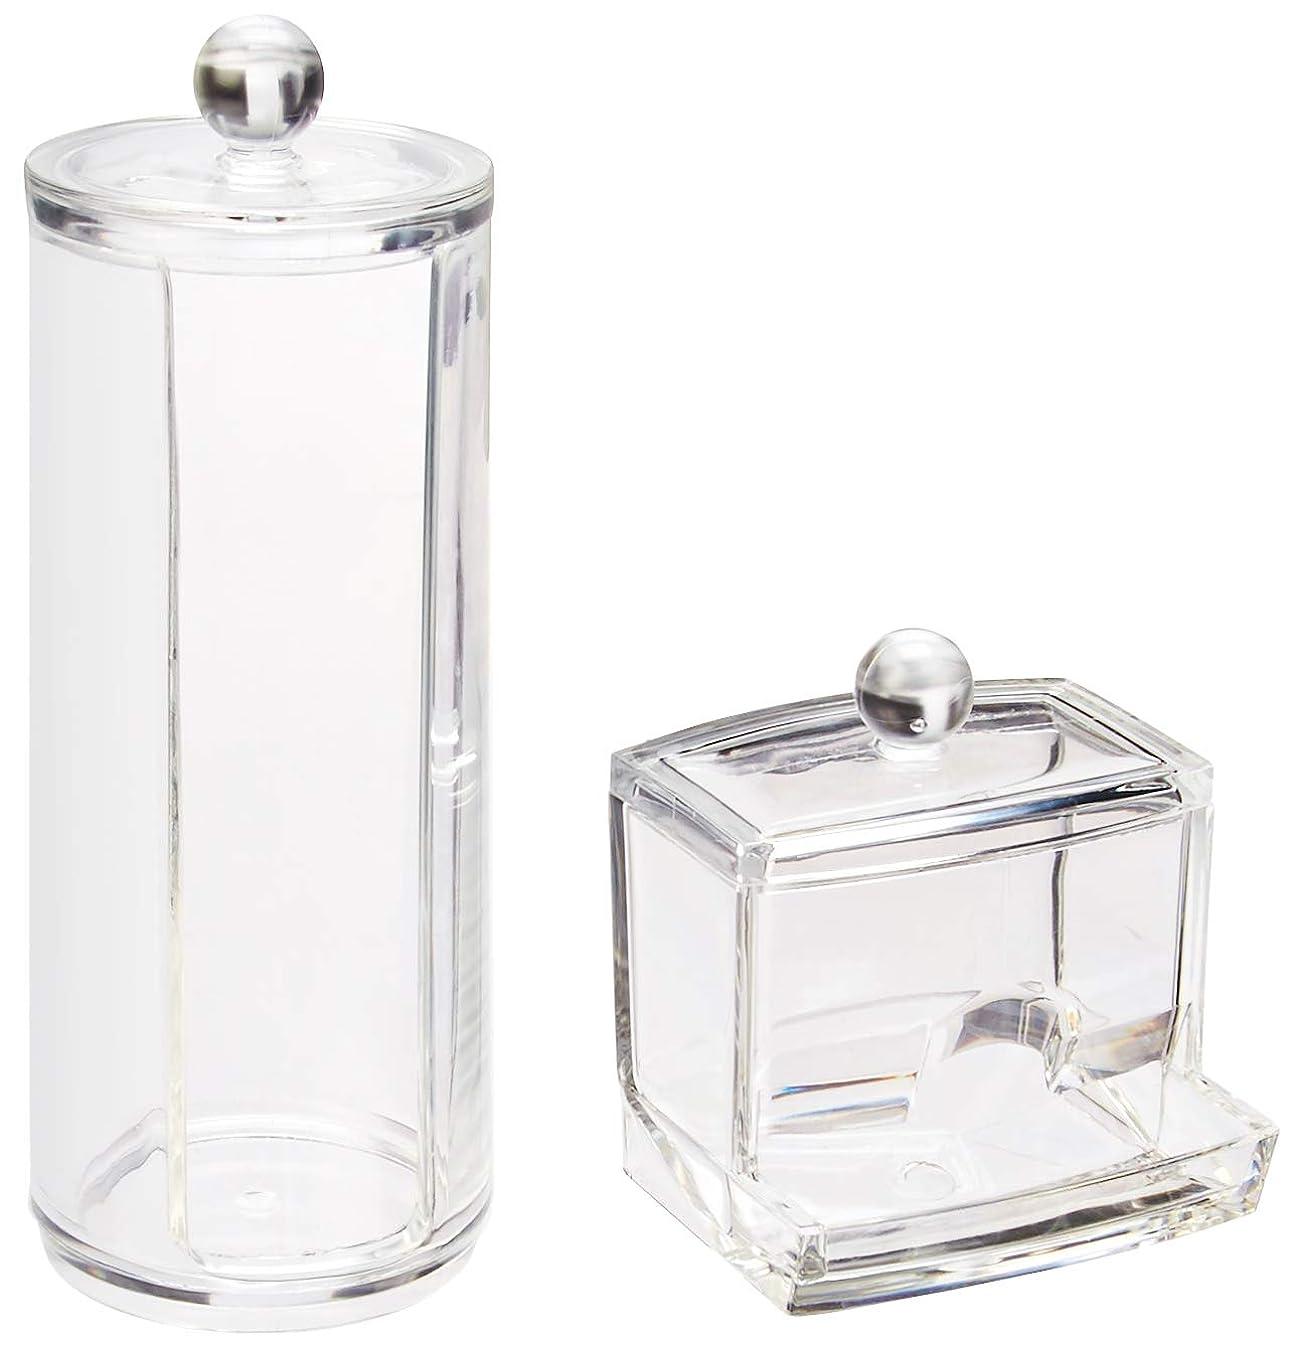 PuTwo Cotton Pads Holder Q-Tips Cotton Swab Q-Tips Holder Cotton Balls Dispenser - 2 Pack